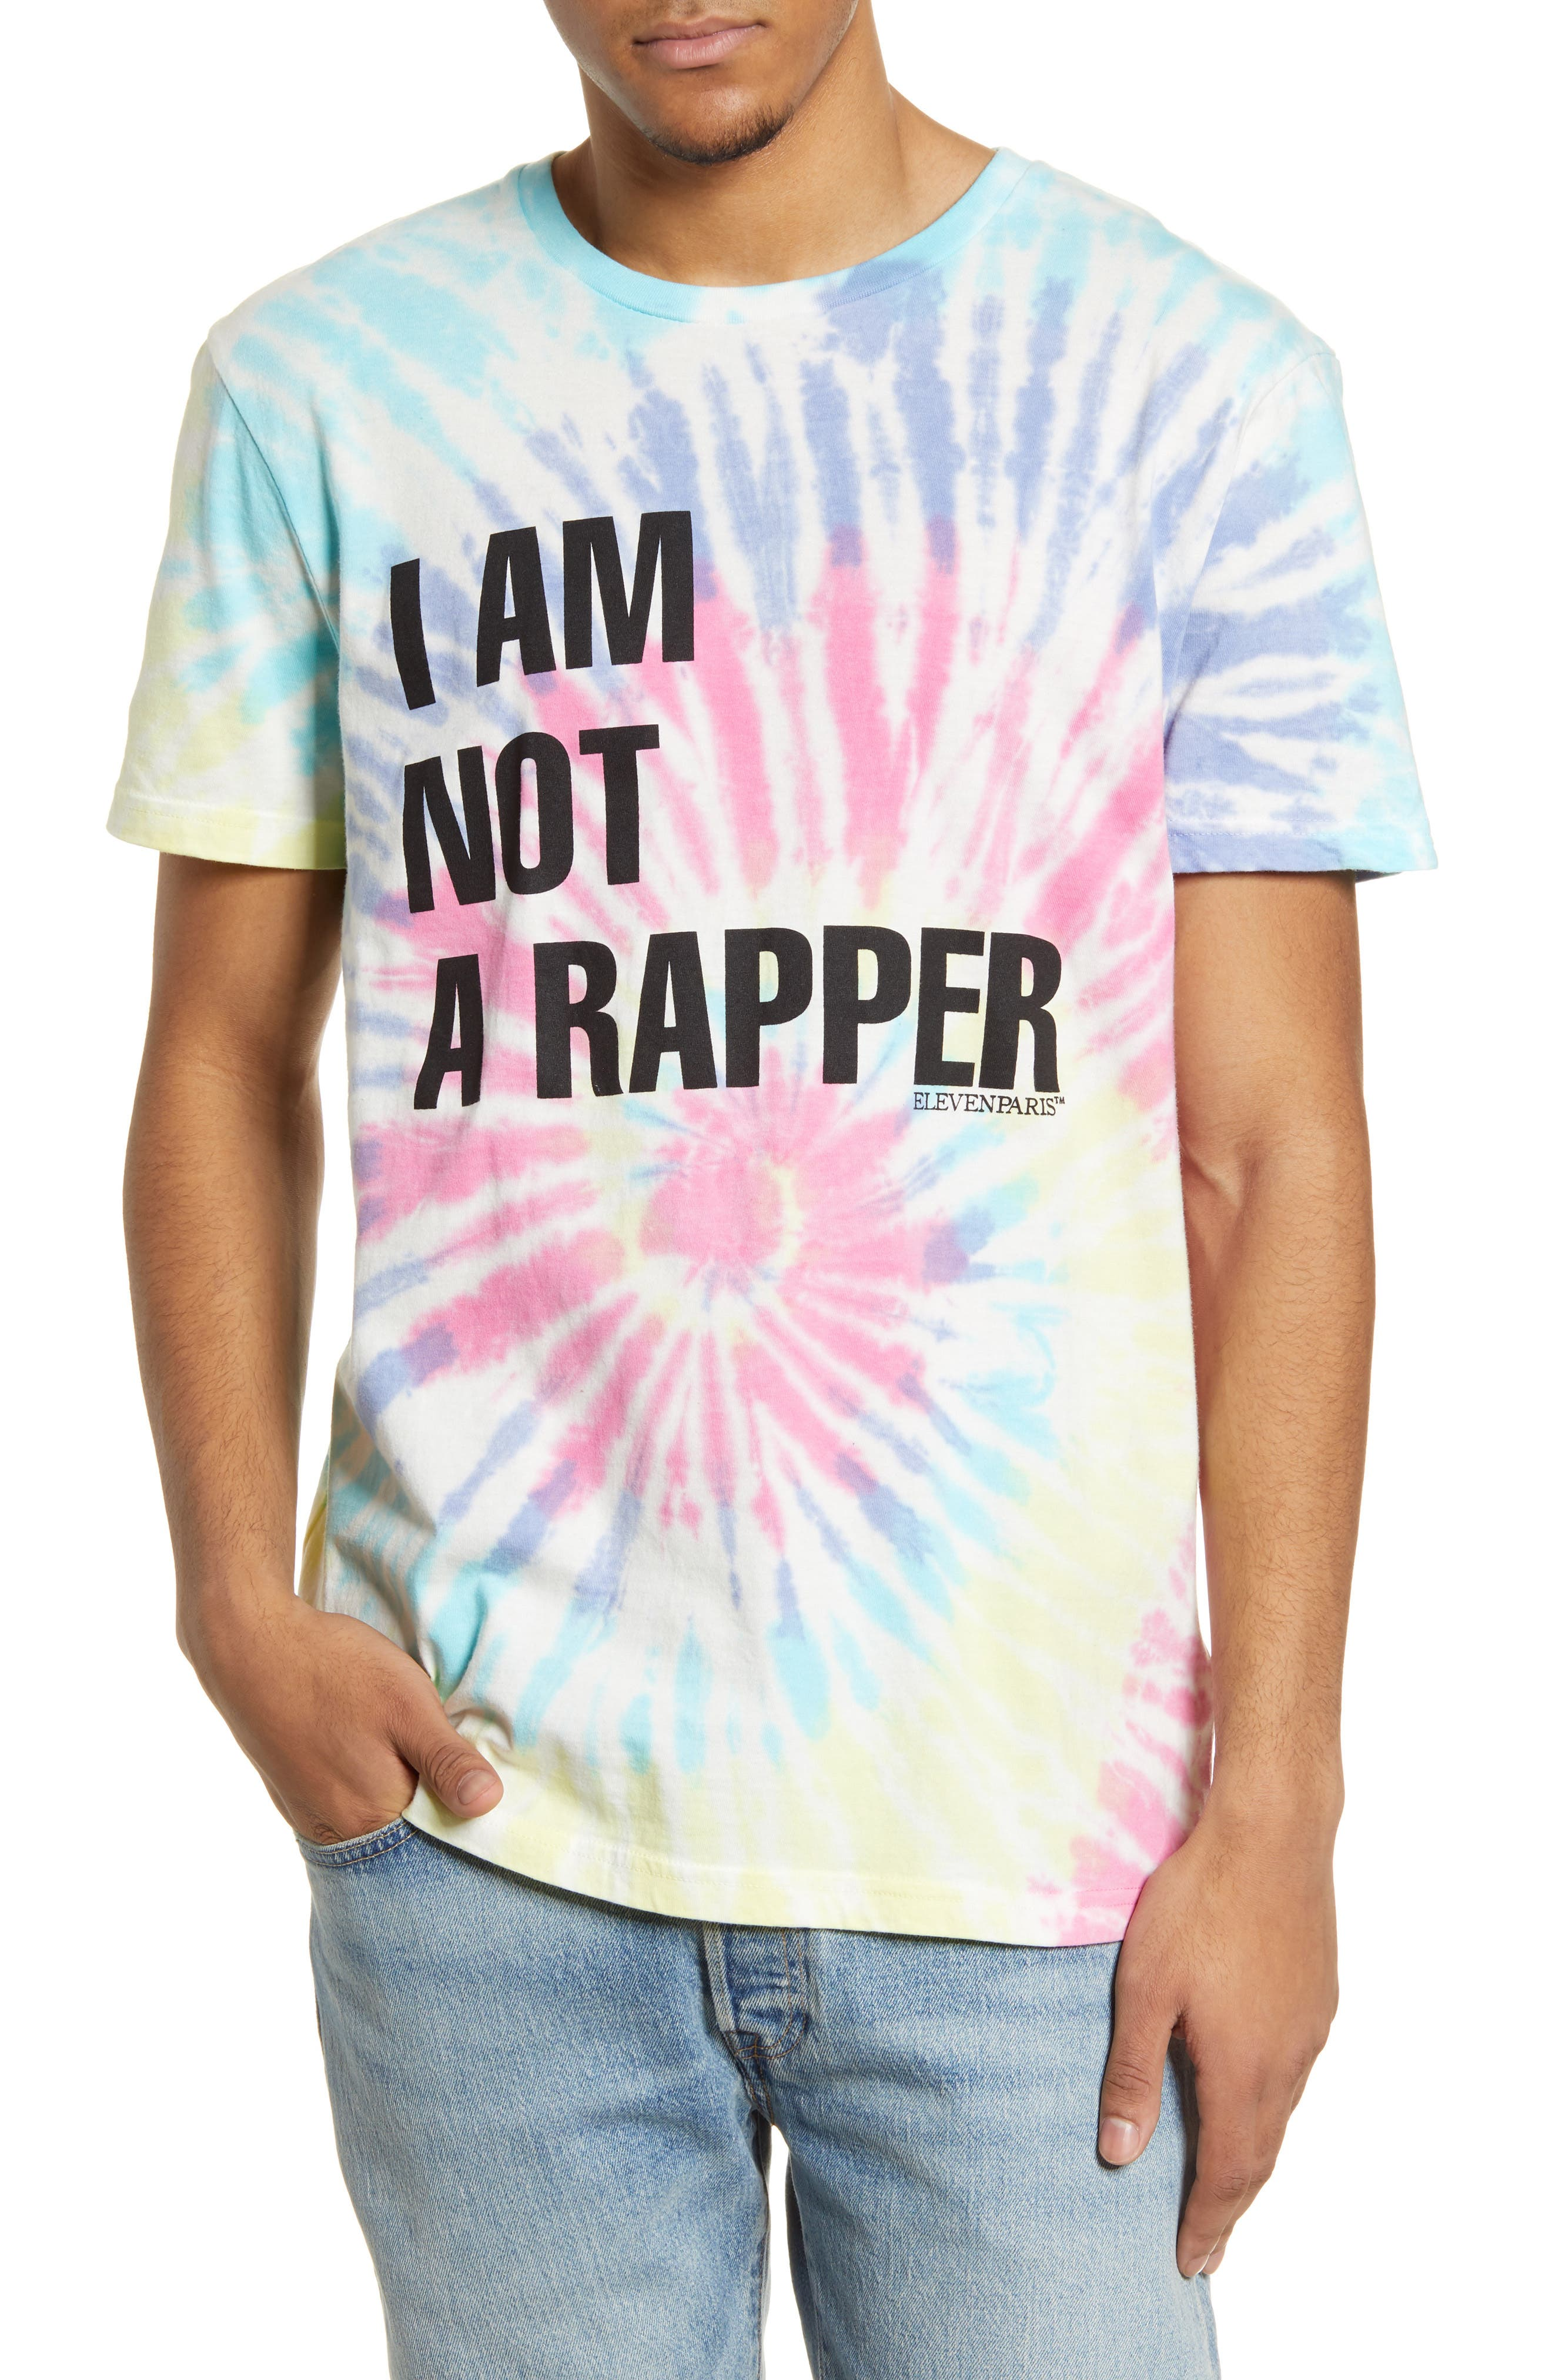 Niam Rapper Tie Dye Graphic Tee